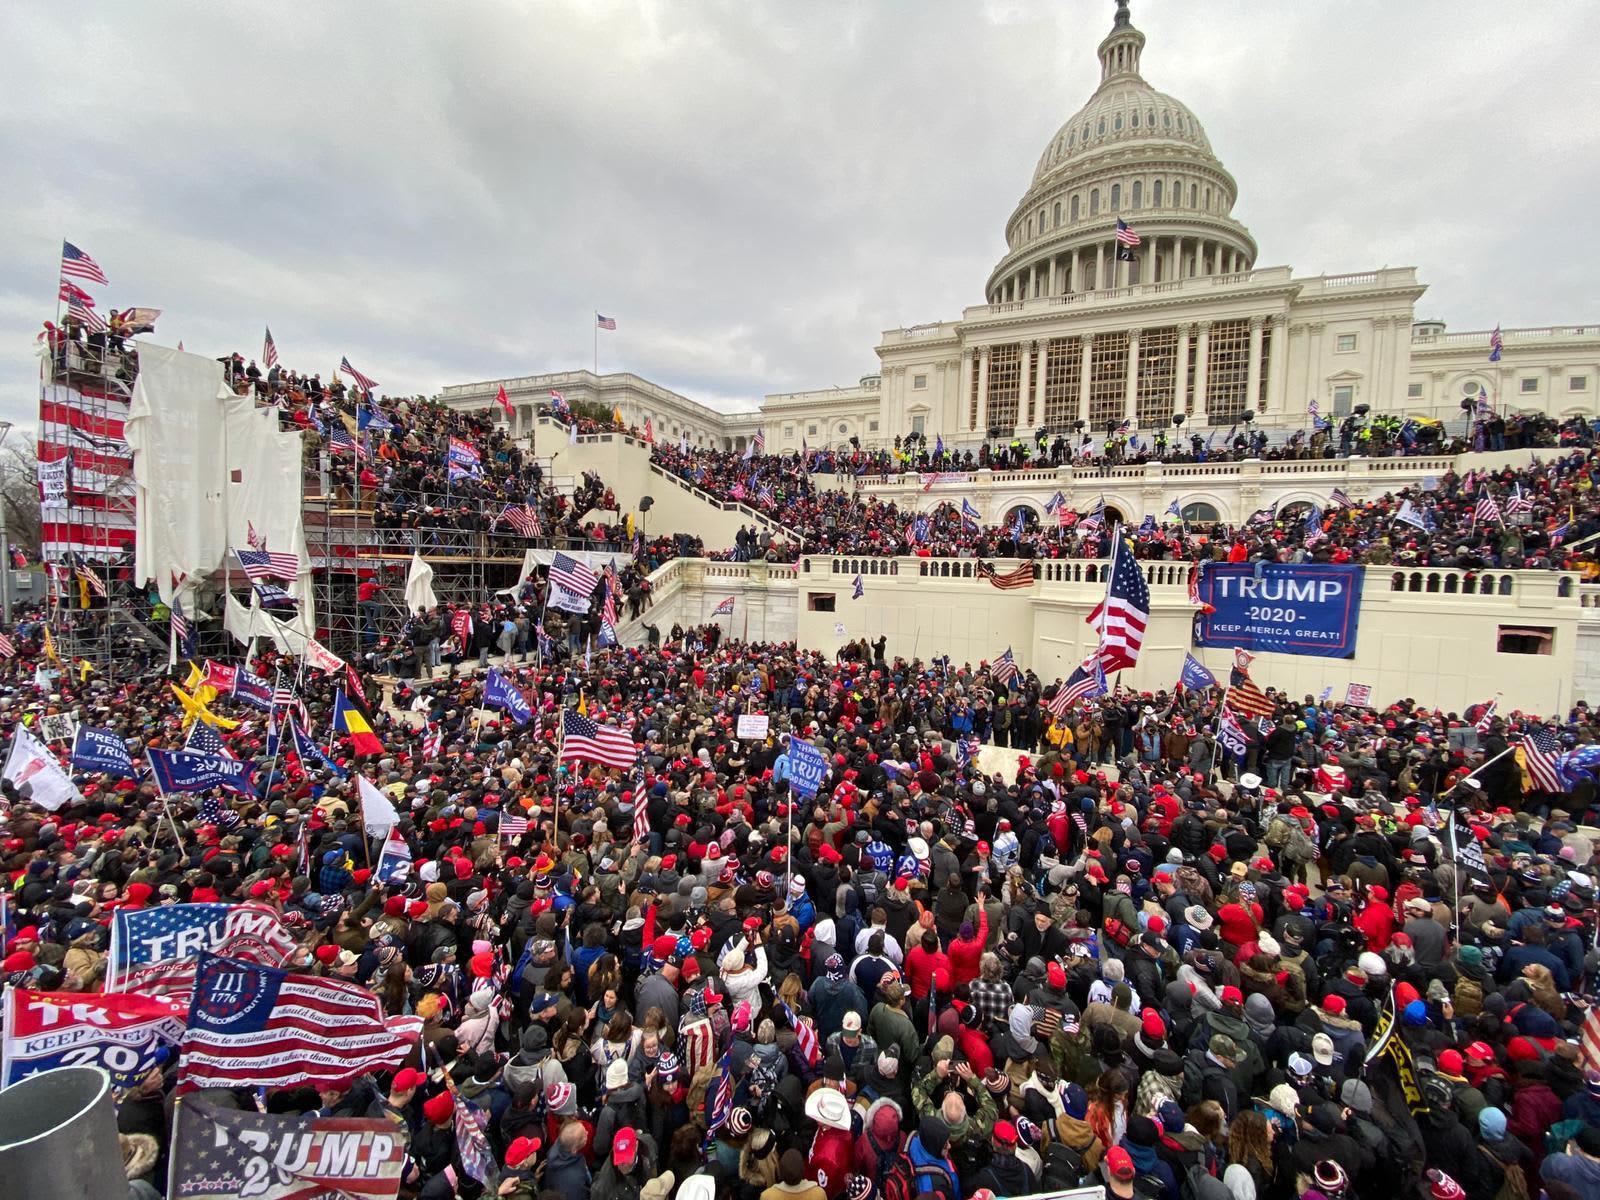 George W. Bush's chief of staff calls Trump a 'mob leader' after Capitol  riots